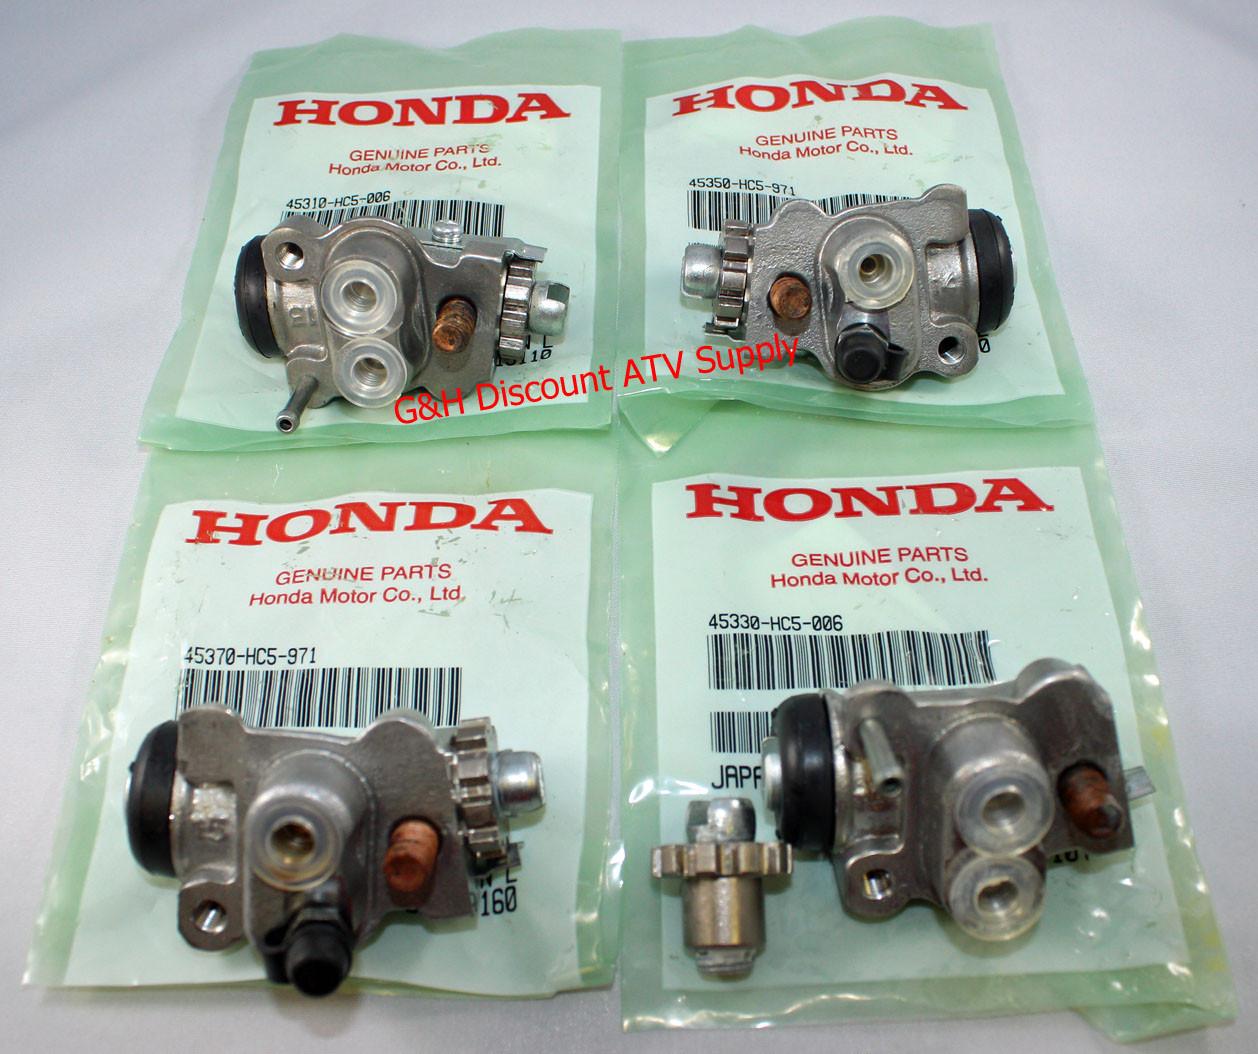 Ohoho Brake Master Cylinder for HONDA 200 250 300 350 400 450 500 TRX Rancher Foreman FourTrax